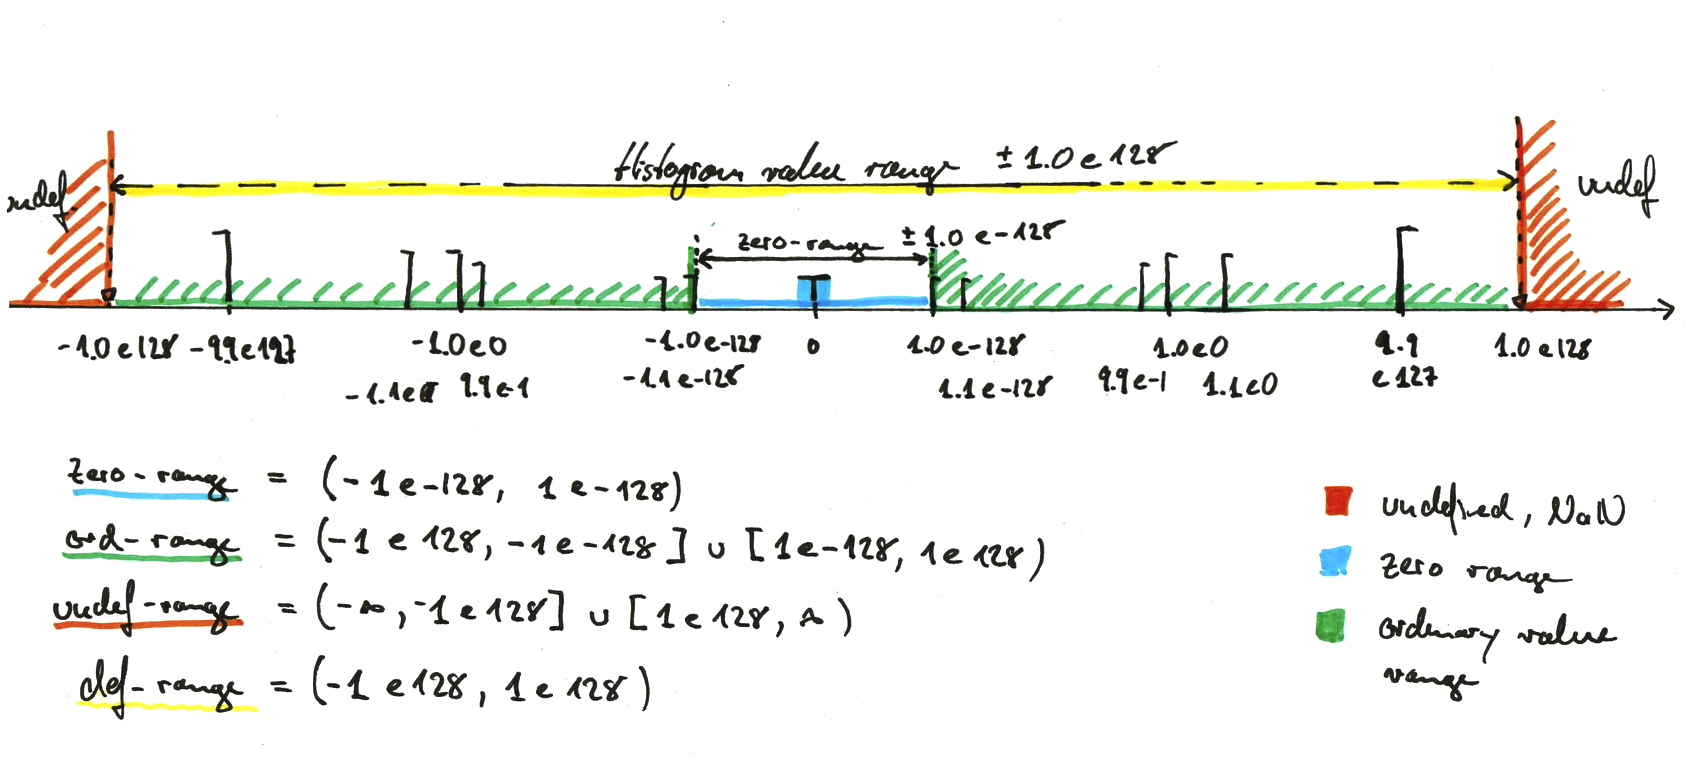 2015-12-02_Circonus_Histogram_range%20copy.png